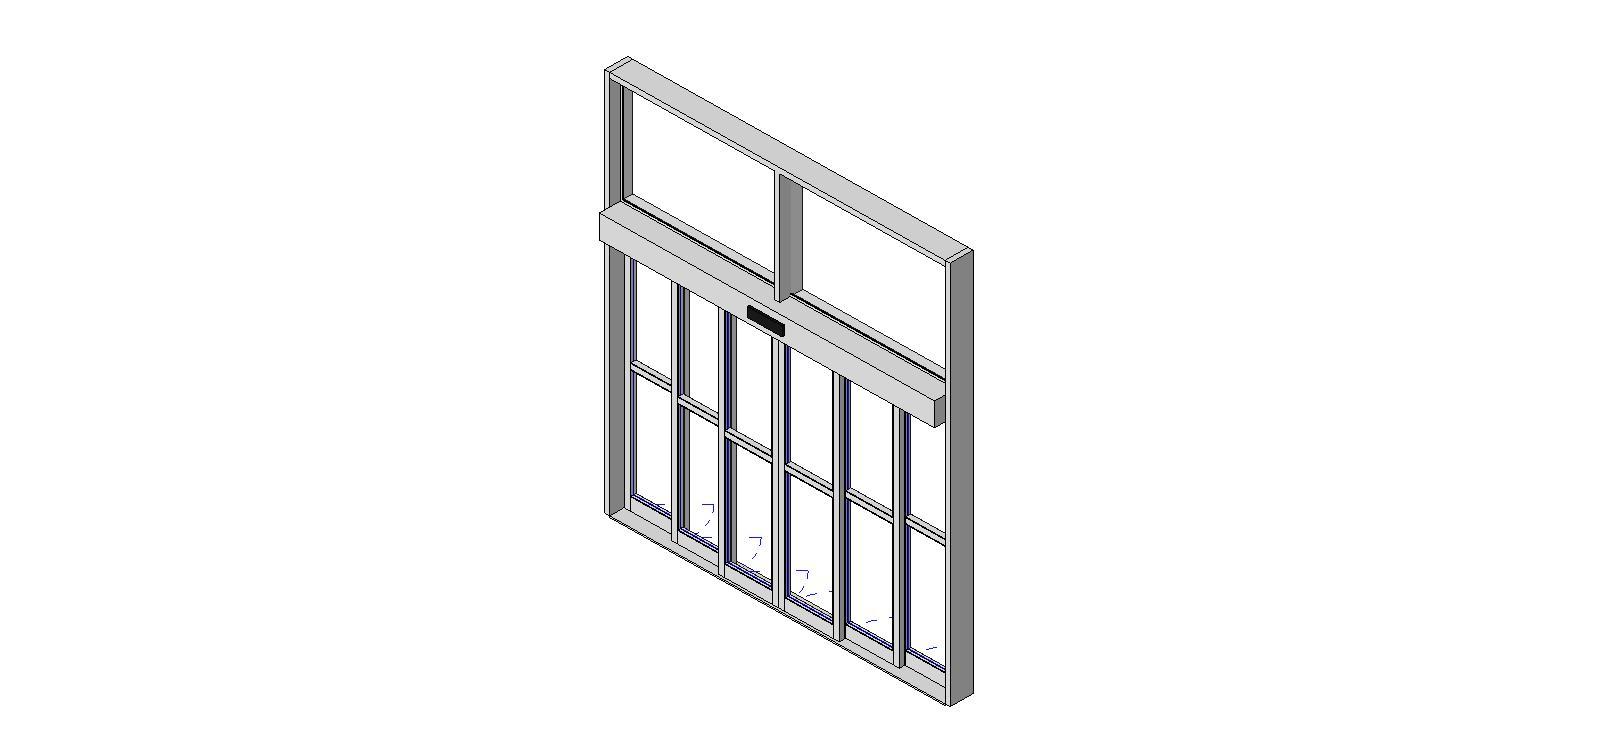 Curtain wall sliding door revit for Sliding window wall